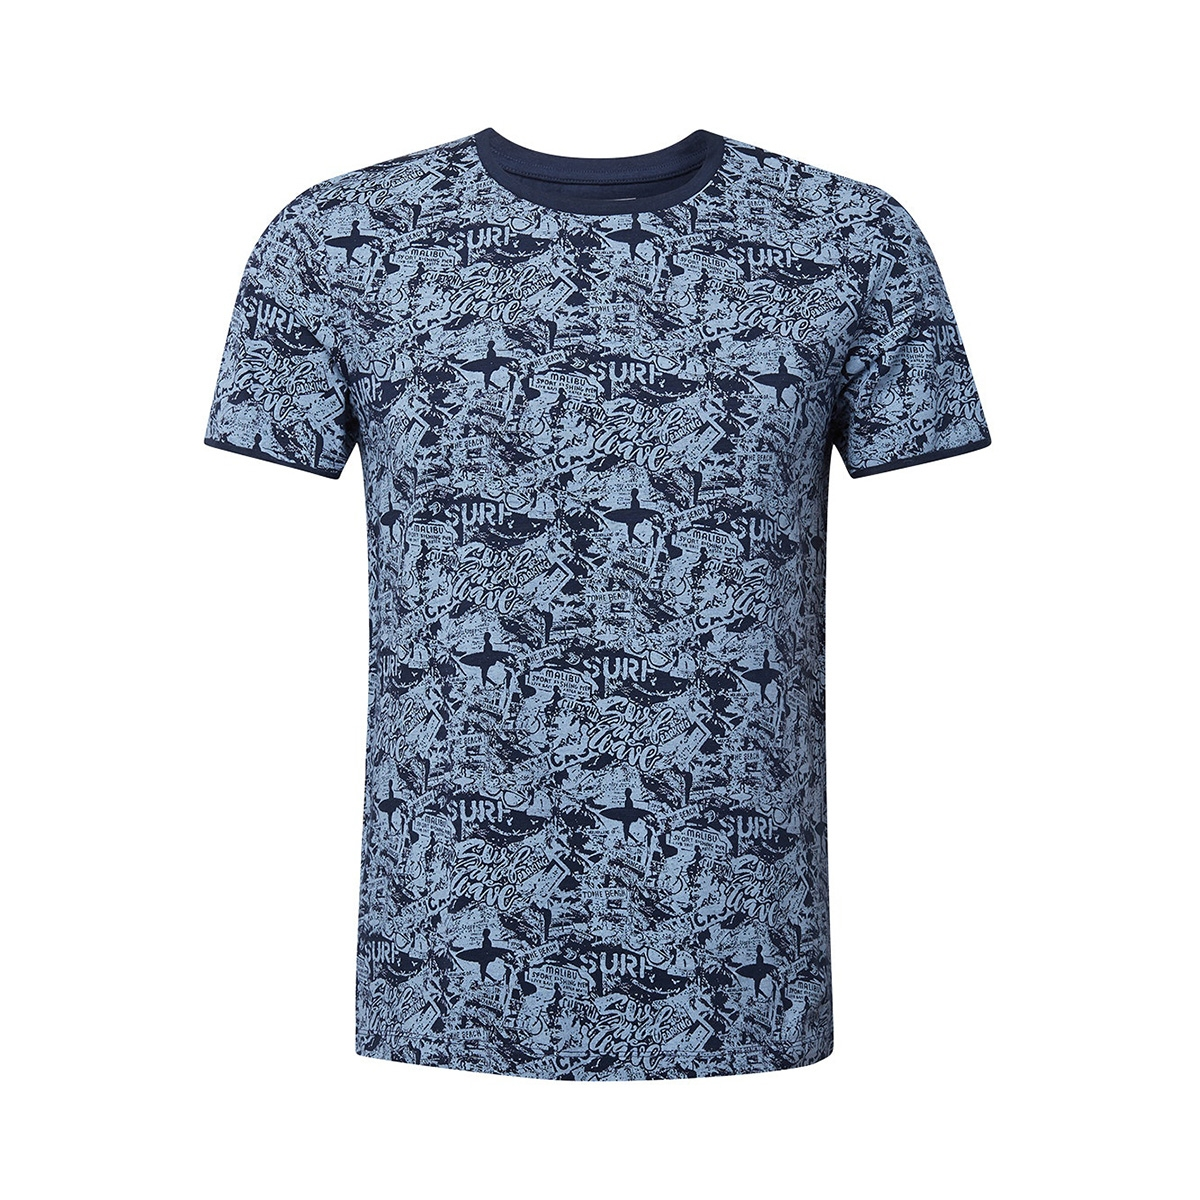 t shirt met all over print 1011138xx12 tom tailor t-shirt 17825